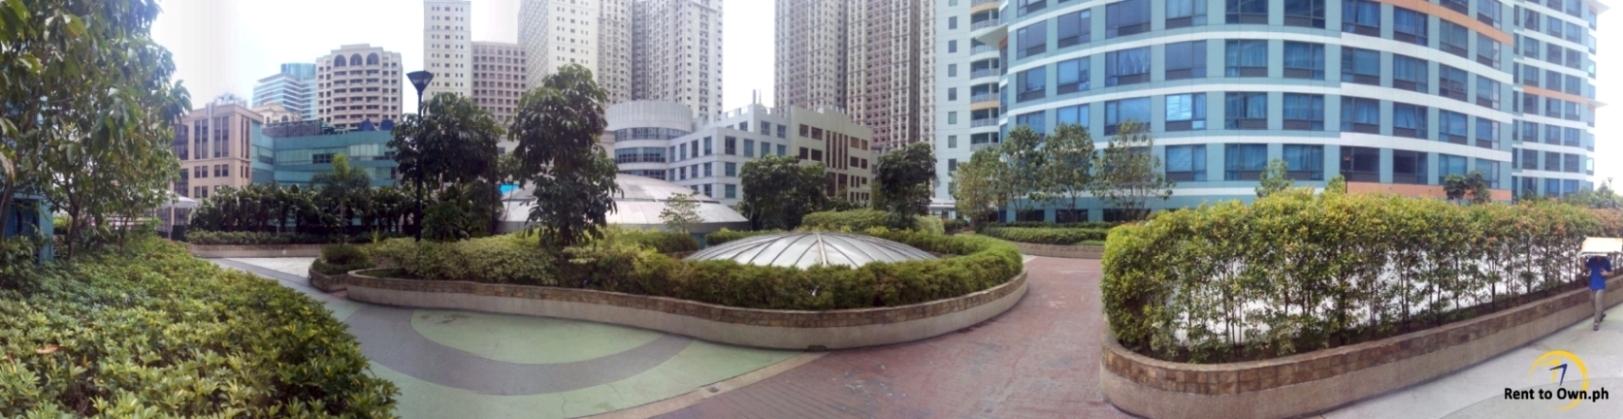 Garden - http://www.renttoown.ph